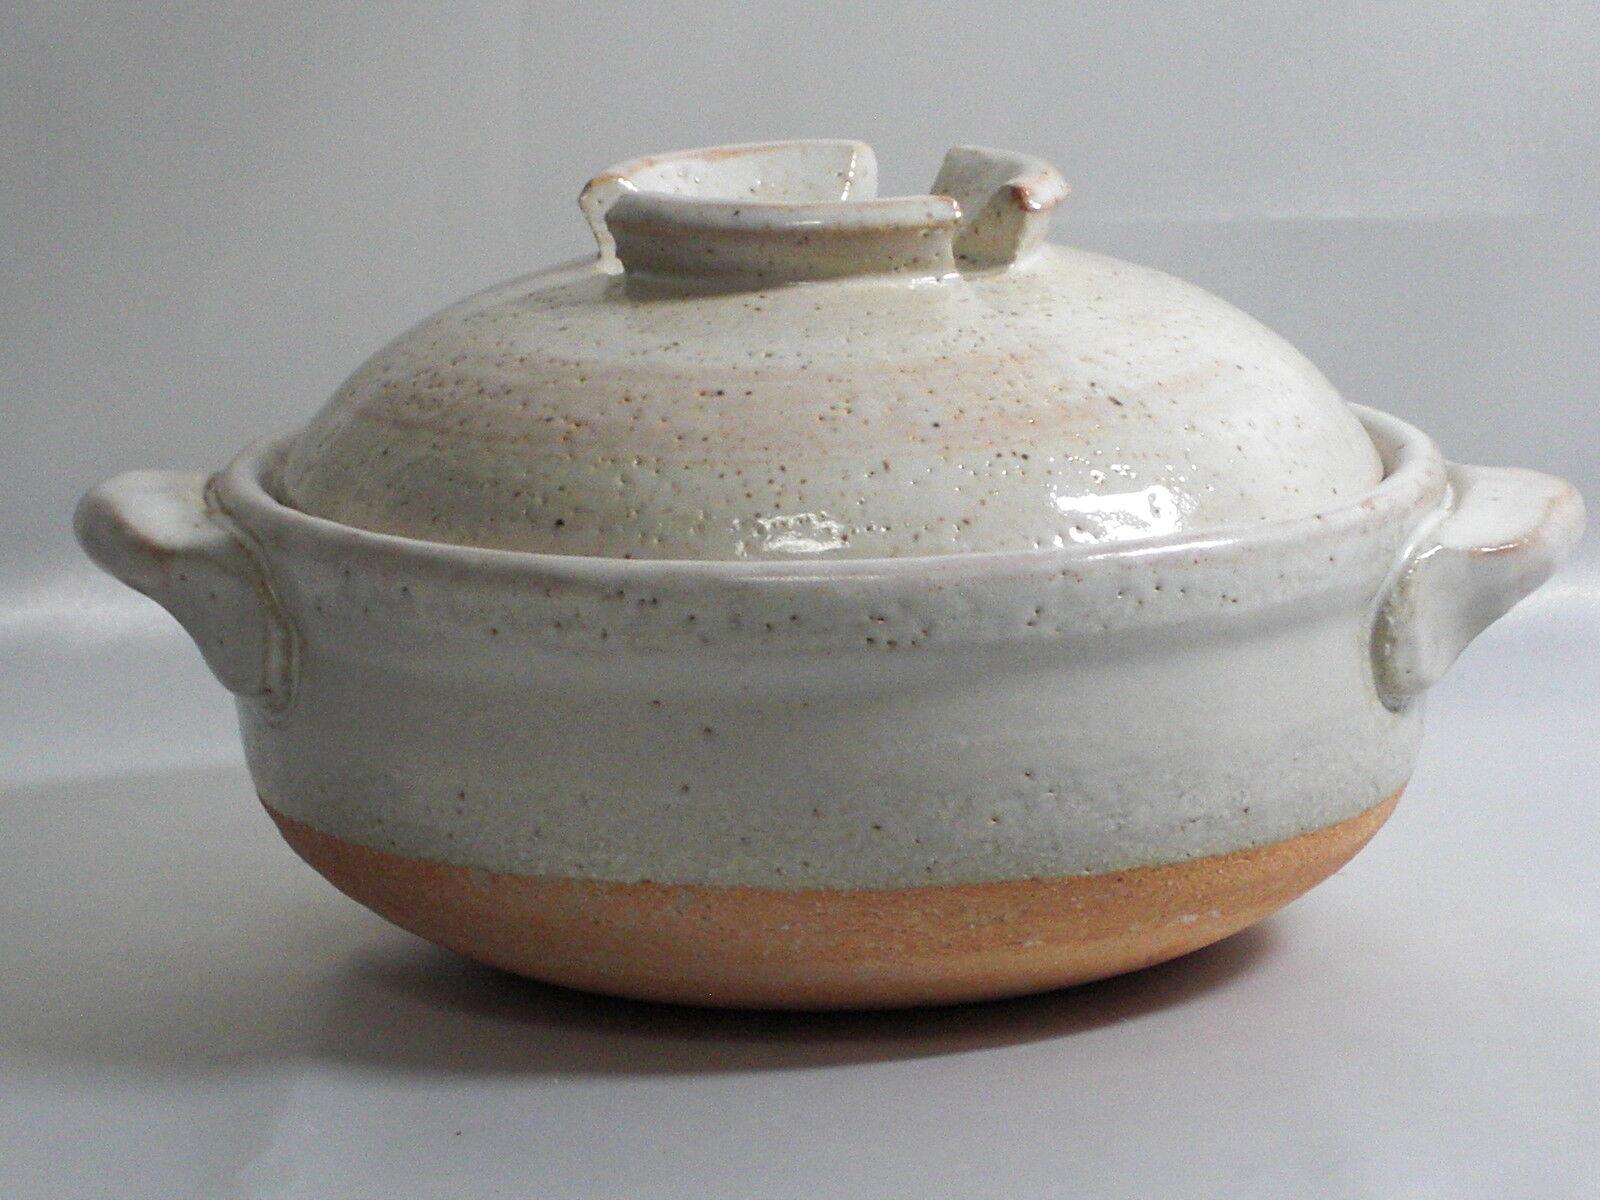 Donabe for 1 or 2 Persons d17cm Größe  Benishino    Shigaraki Stoneware Japanese